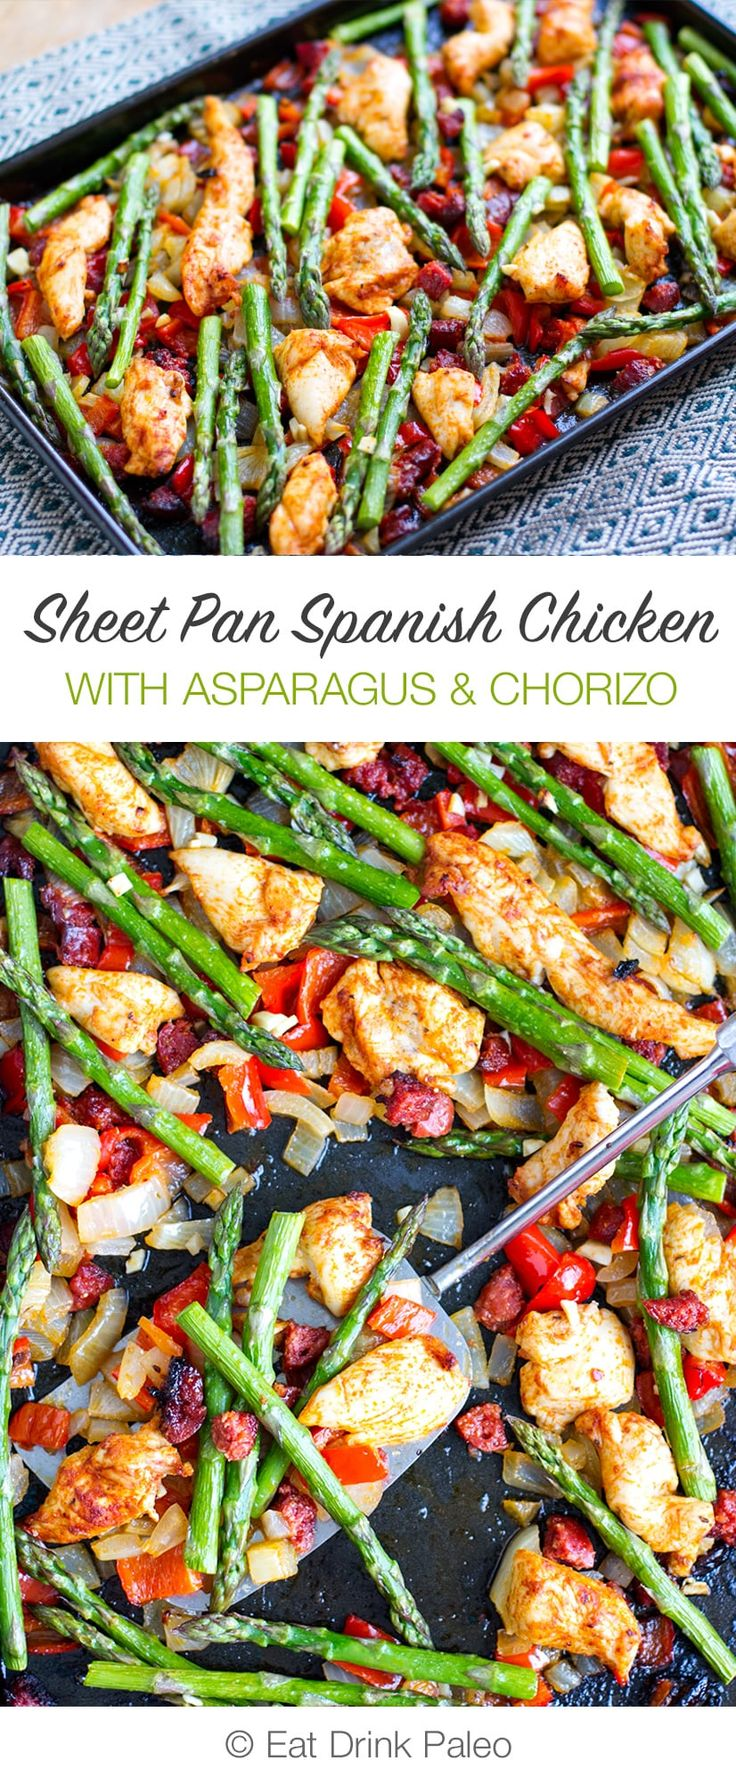 Sheet Pan Roasted Asparagus and Chicken With Chorizo | http://eatdrinkpaleo.com.au/sheet-pan-roasted-asparagus-chicken-with-chorizo/